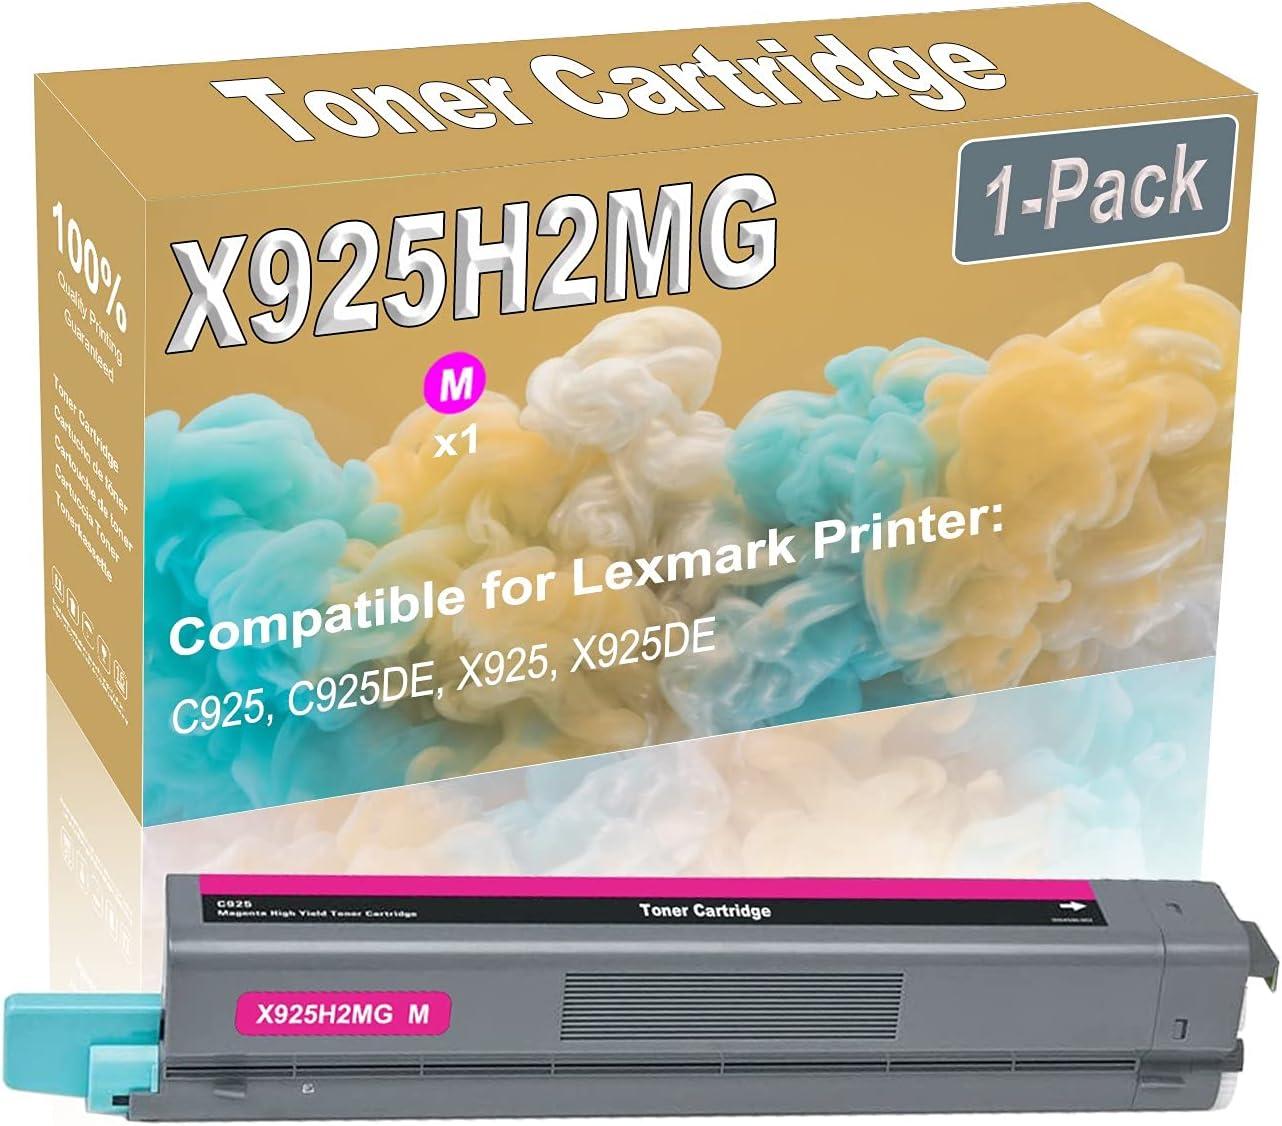 1-Pack (Magenta) Compatible C925 C925DE X925 X925DE Laser Toner Cartridge (High Capacity) Replacement for Lexmark X925H2MG Printer Toner Cartridge